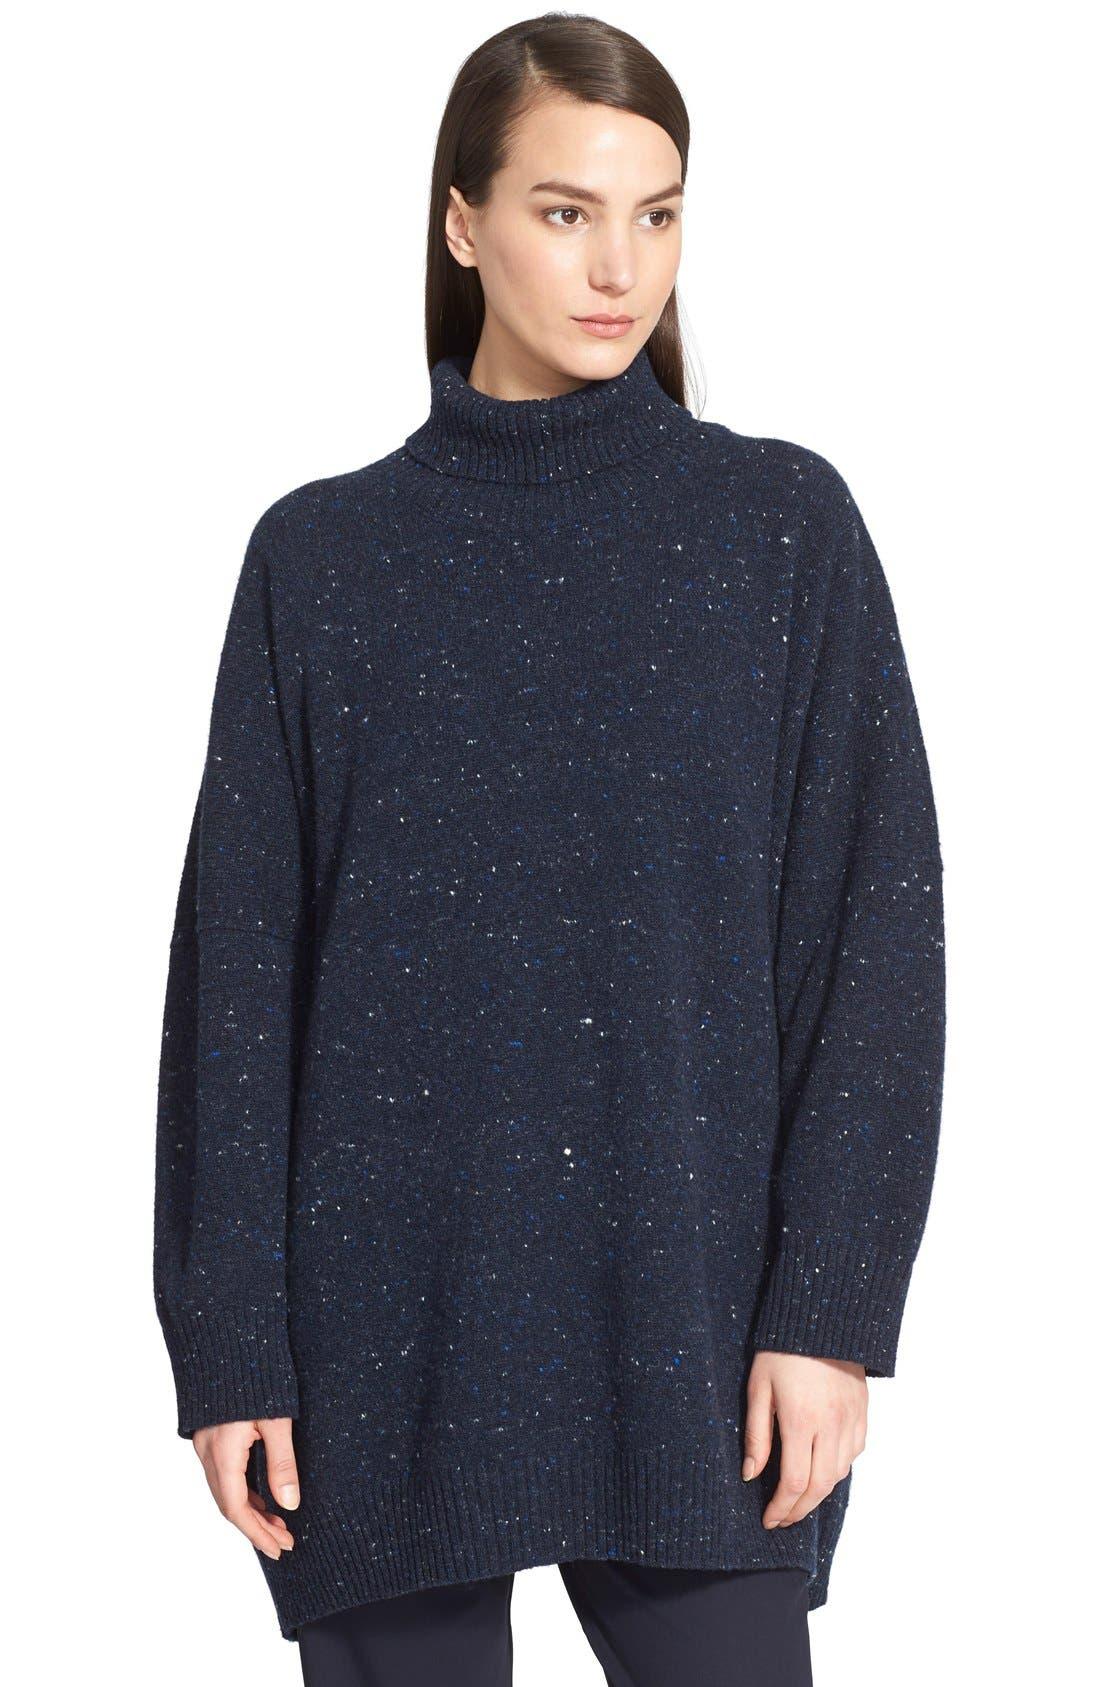 Alternate Image 1 Selected - eskandar Lightweight Tweed Turtleneck Sweater